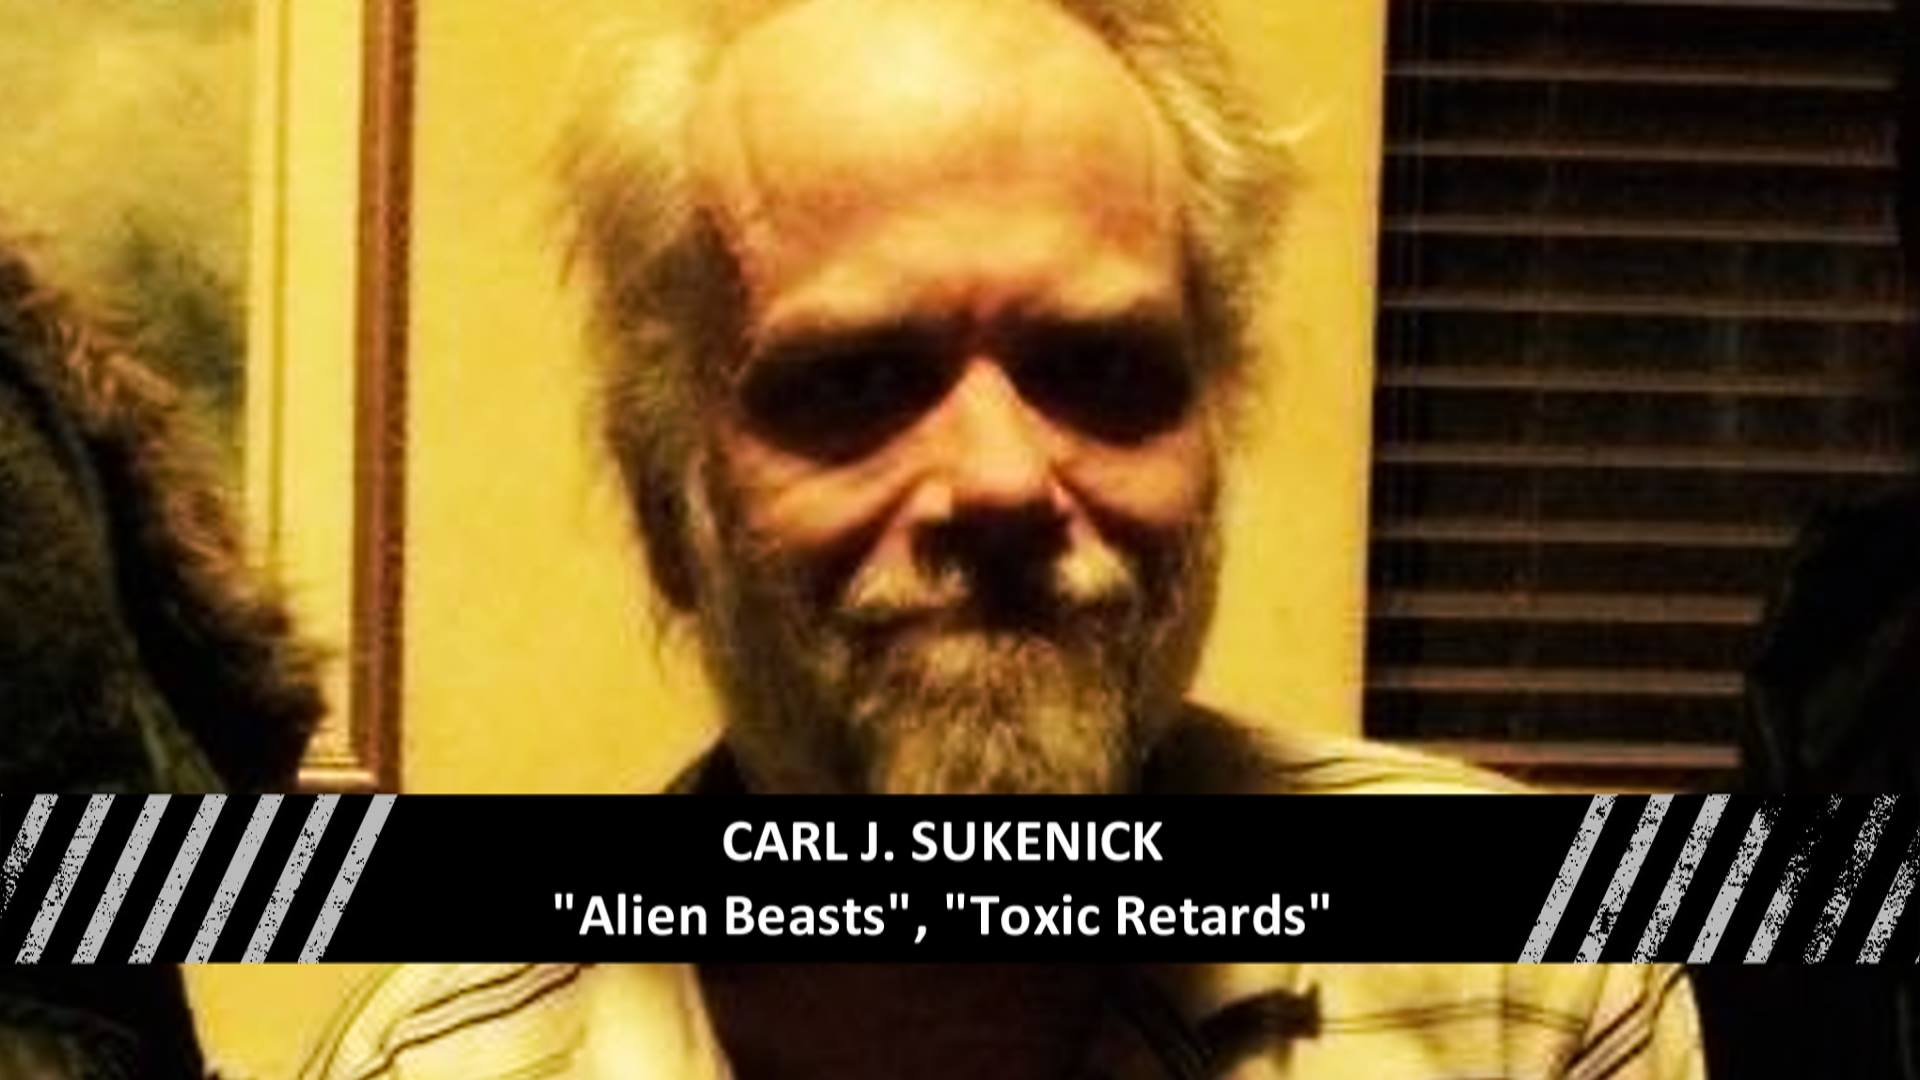 Carl Sukenick